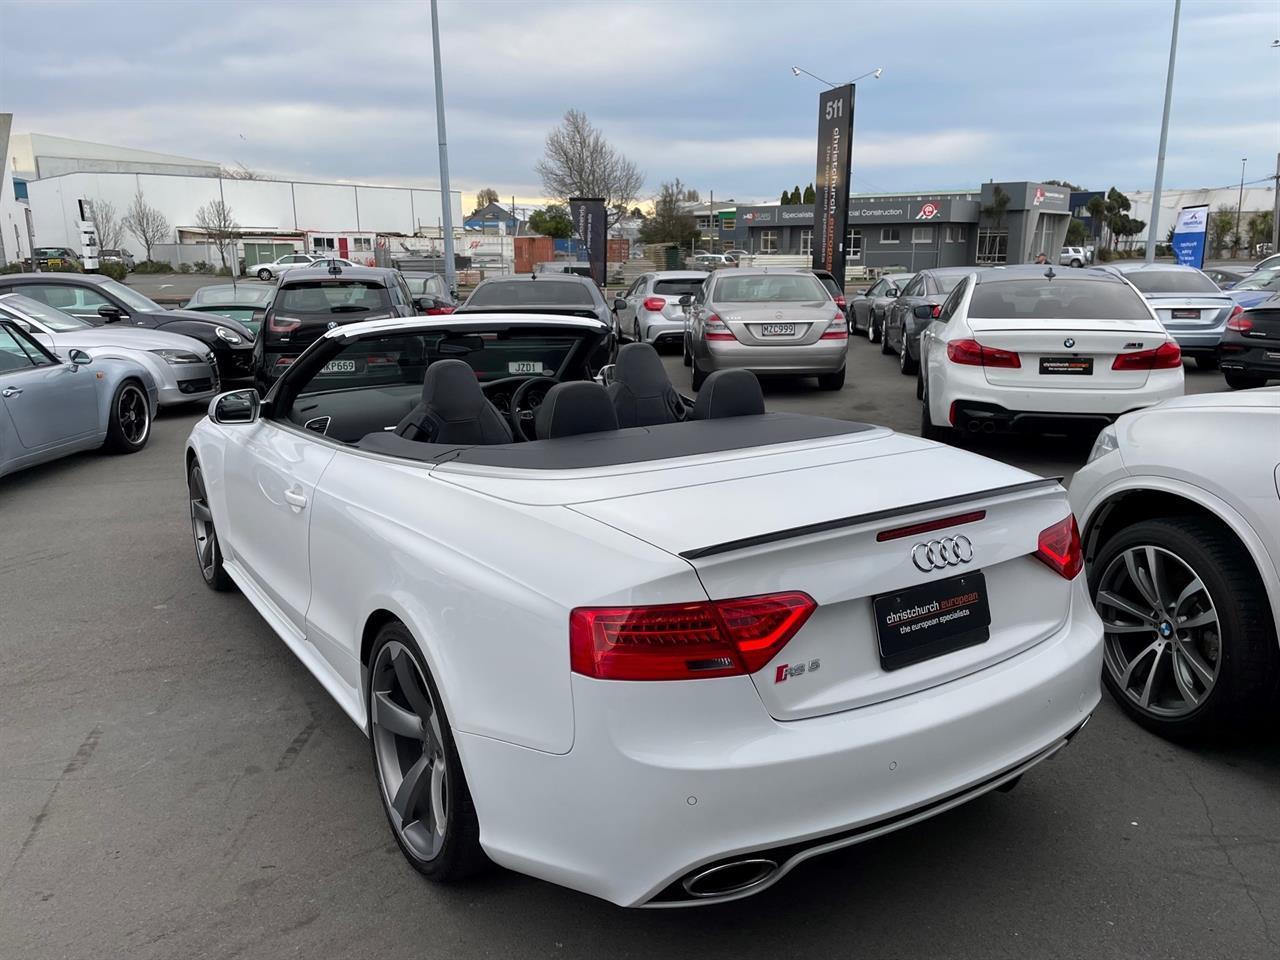 image-3, 2013 Audi RS5 4.2 V8 FSI Facelift Convertible at Christchurch